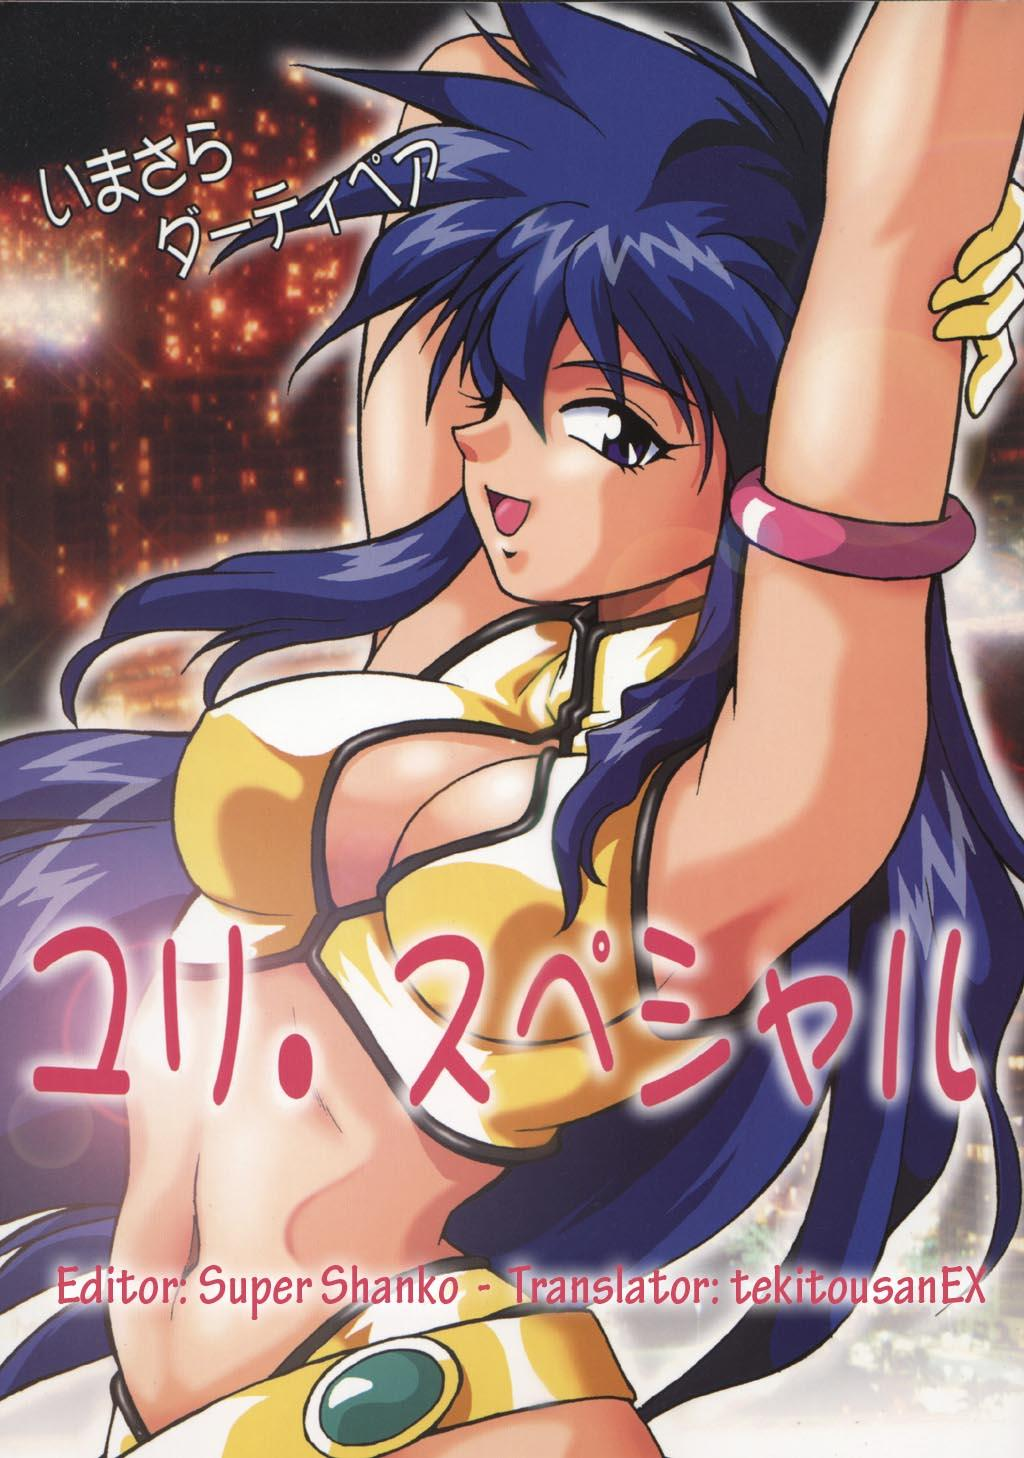 (C65) [Studio Katsudon] Imasara Dirty Pair Yuri Special (Dirty Pair)[English]-[tekitousanEX+Super Shanko] 0